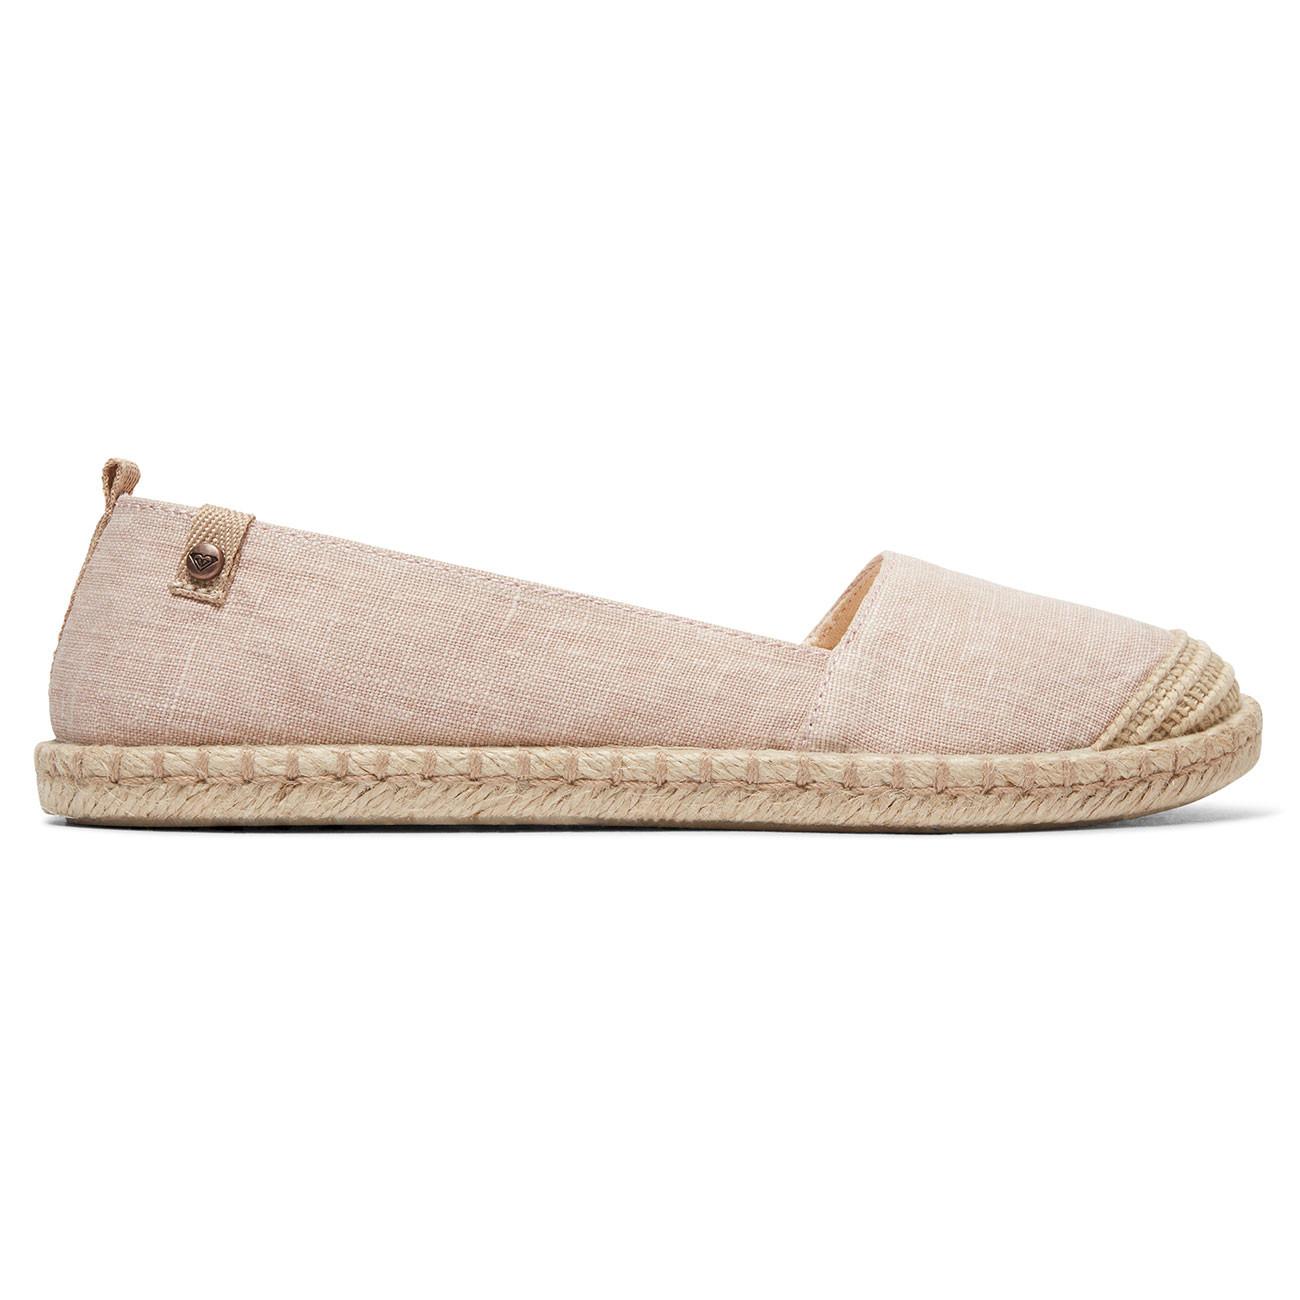 c251b0b6f Sneakers Roxy Felicity blush | Snowboard Zezula